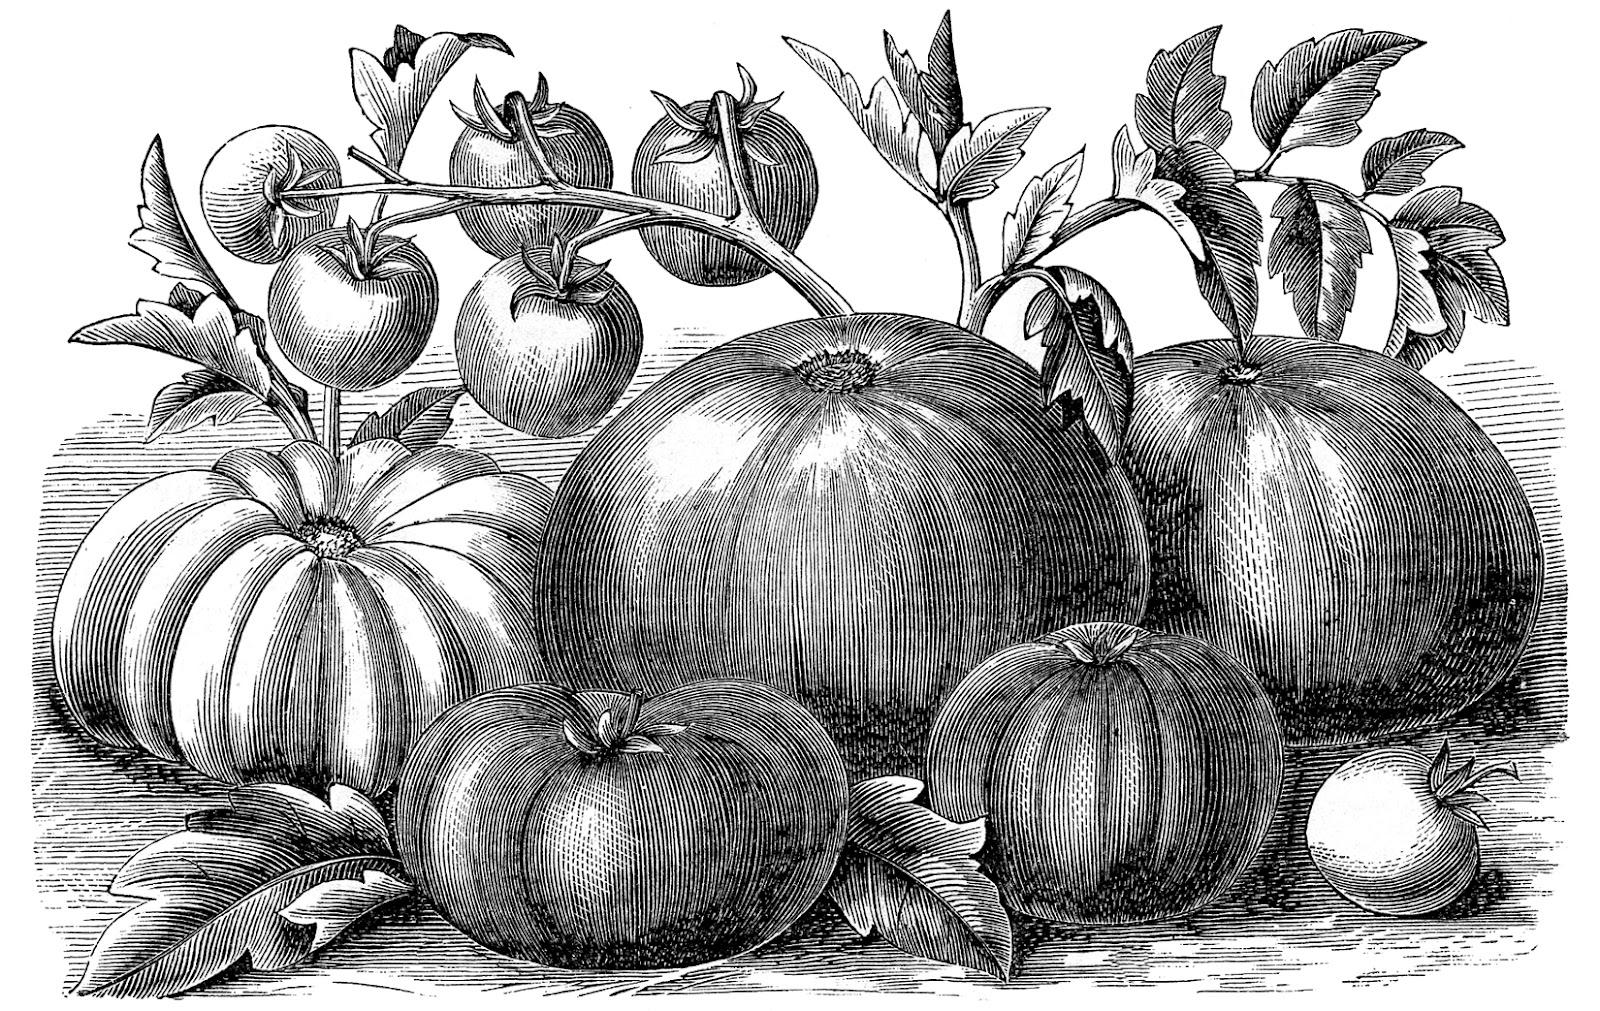 http://thegraphicsfairy.com/wp-content/uploads/blogger/-ziiNoWknEEs/UBAdx-pfUnI/AAAAAAAAS60/4w1GUhhuKv8/s1600/tomatoes-GraphicsFairy.jpg